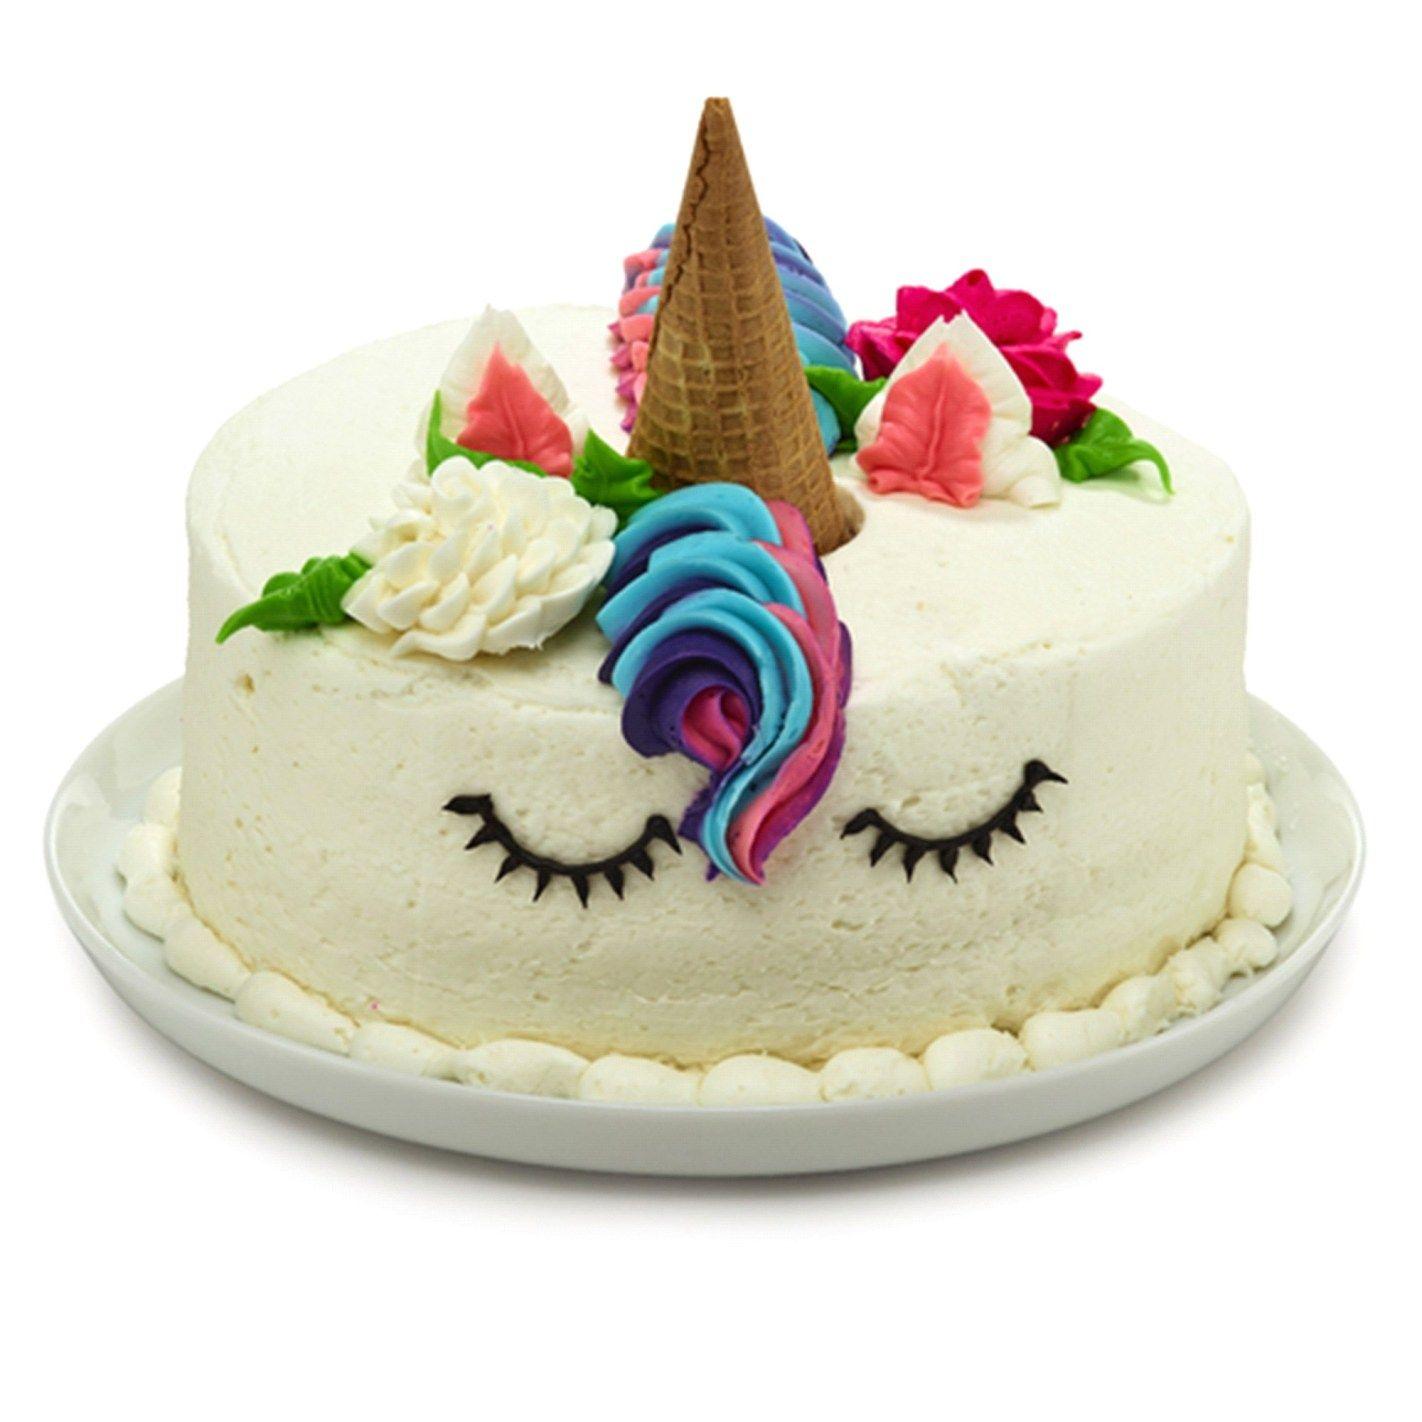 Pleasing 23 Great Photo Of Meijer Birthday Cakes Savoury Cake Cake Funny Birthday Cards Online Elaedamsfinfo